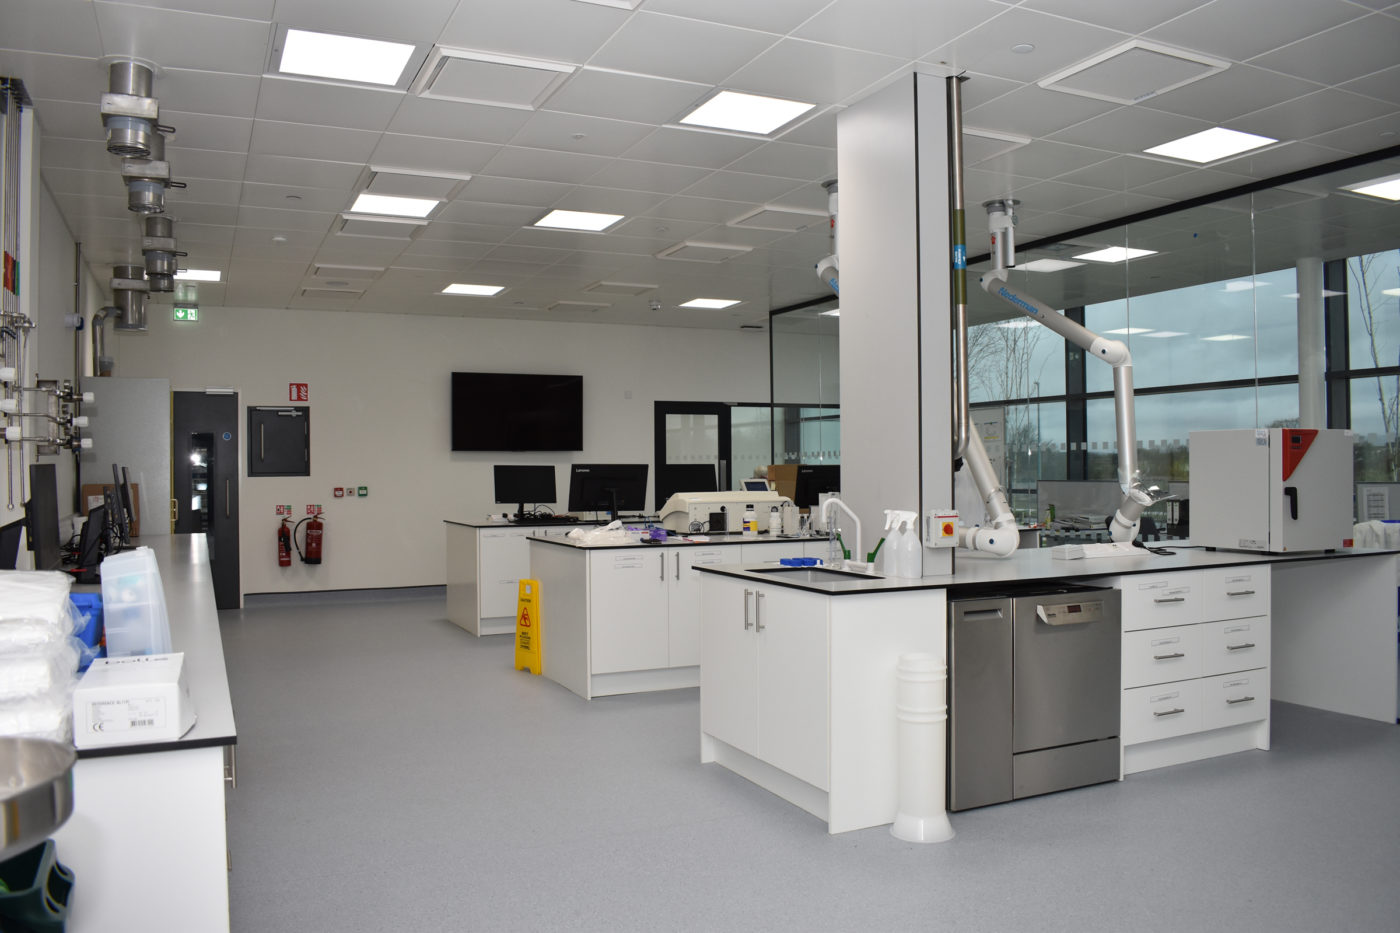 Greenfield Laboratory